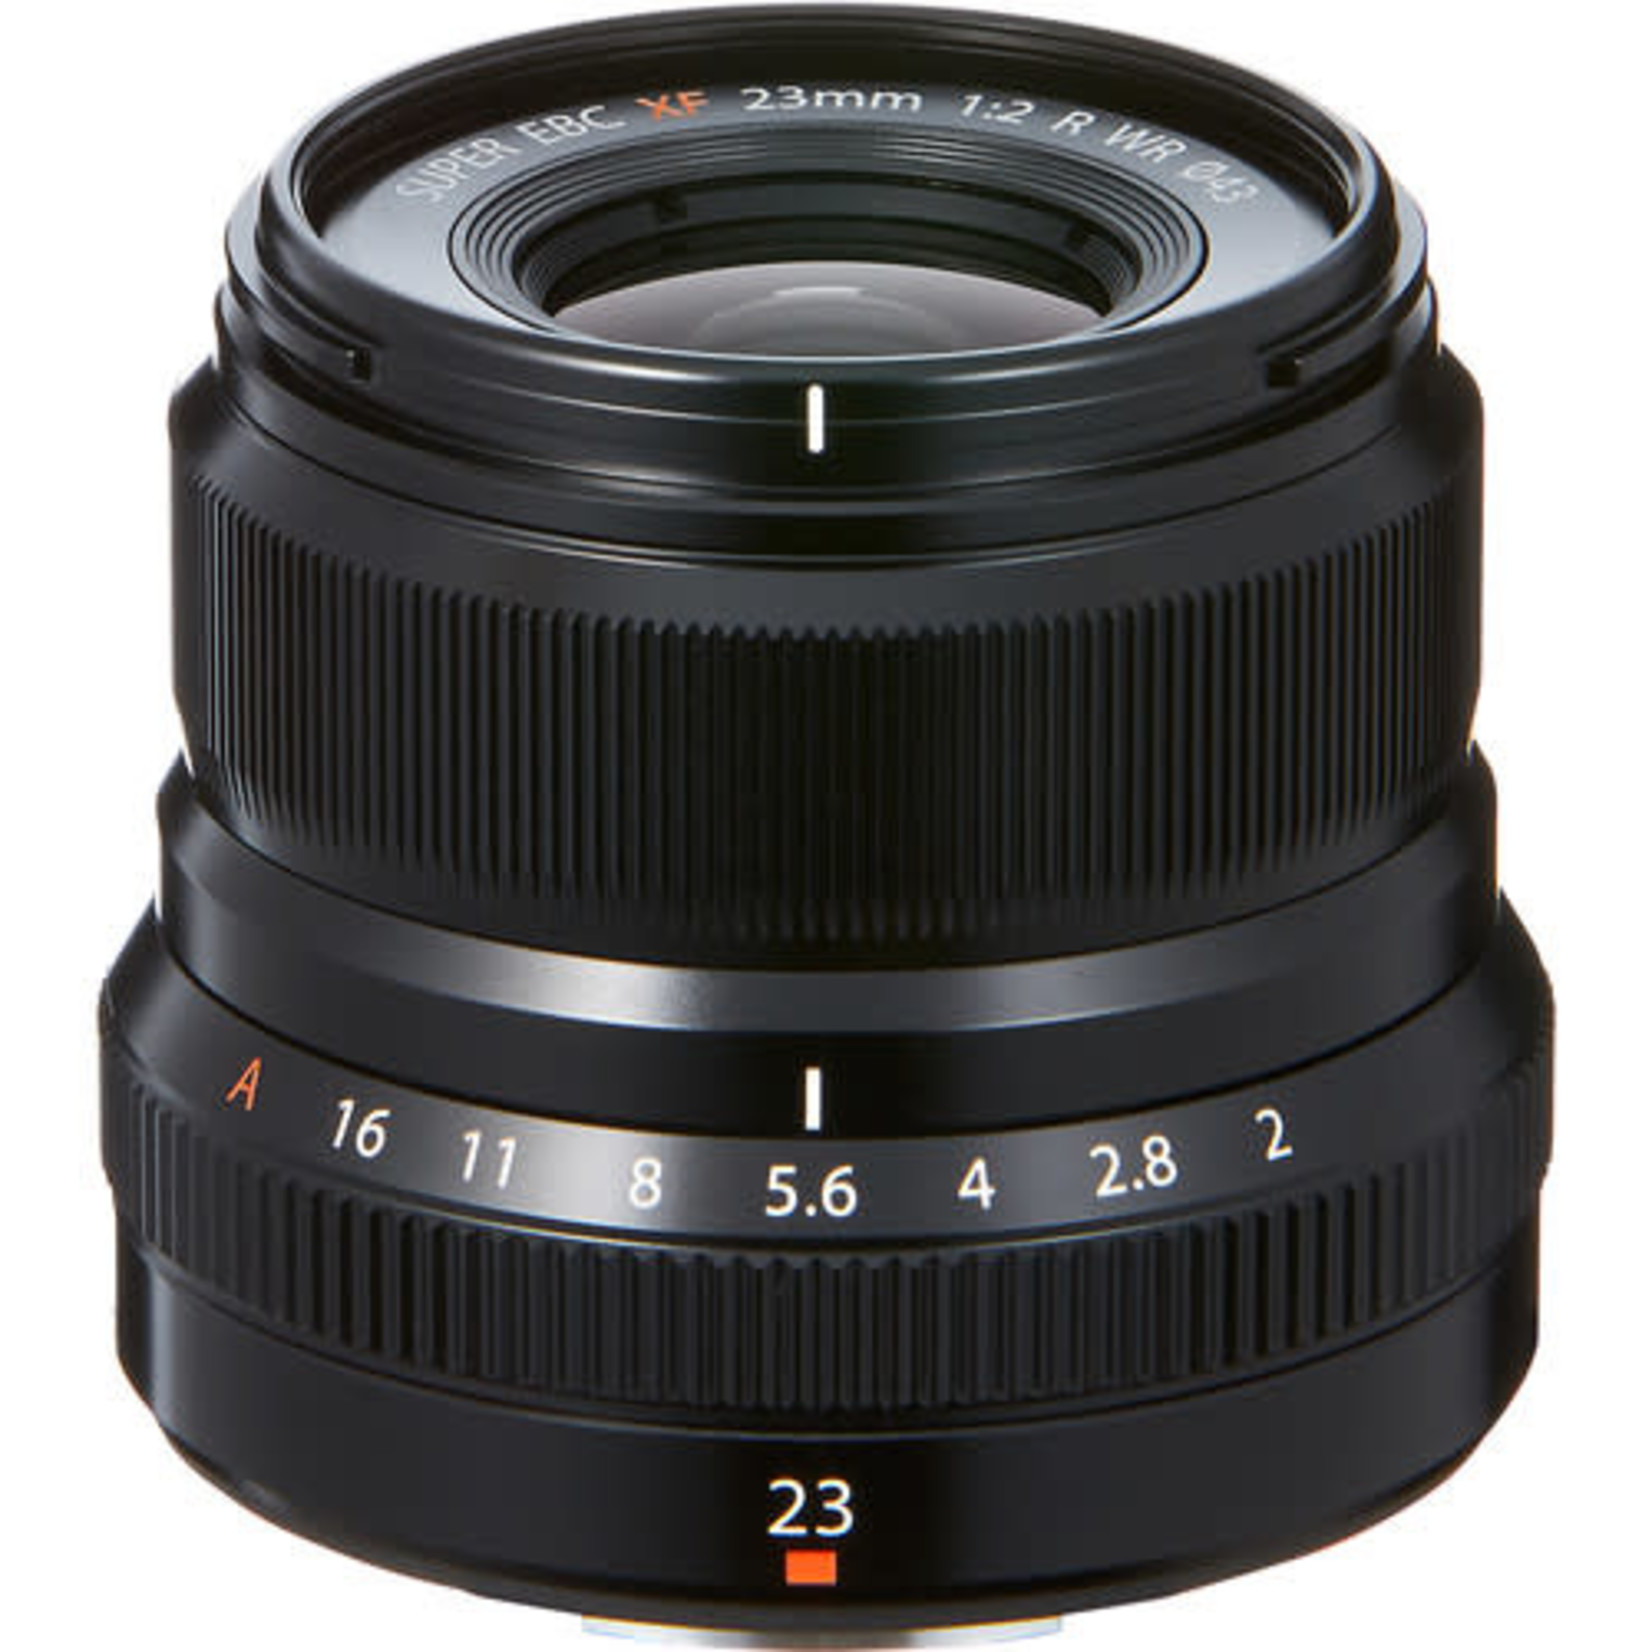 FujiFilm FujiFilm XF 23mm f/2 R WR Lens